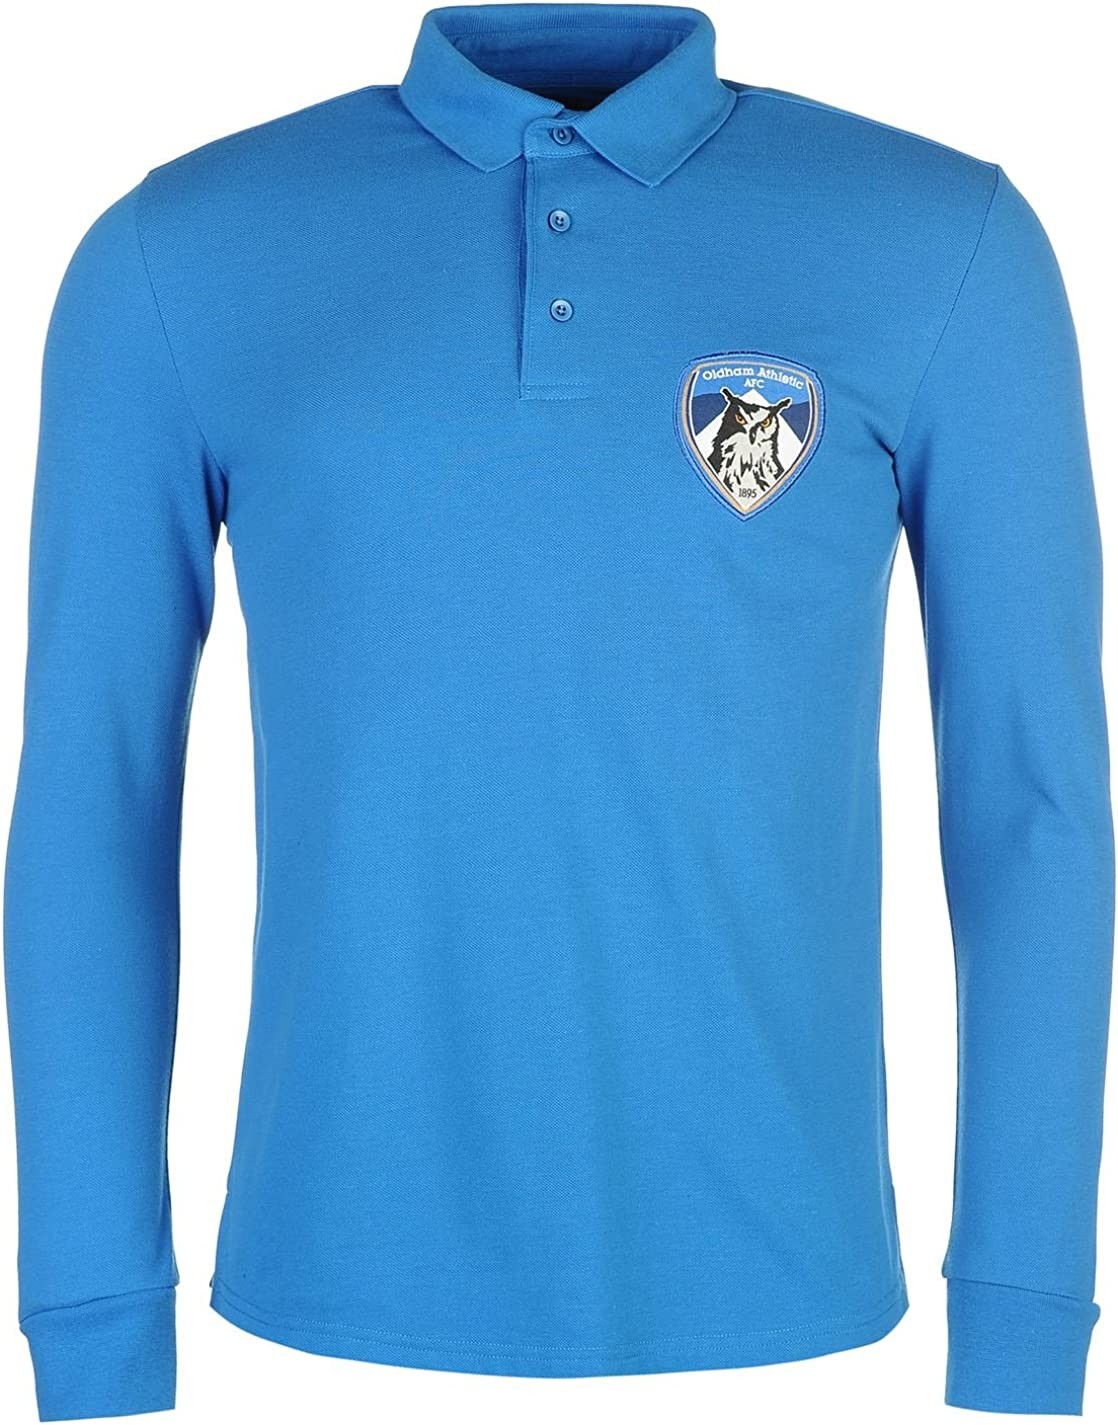 Team Hombre Athletic Futbol Club Polo Camisa Casual Mangas Largas ...